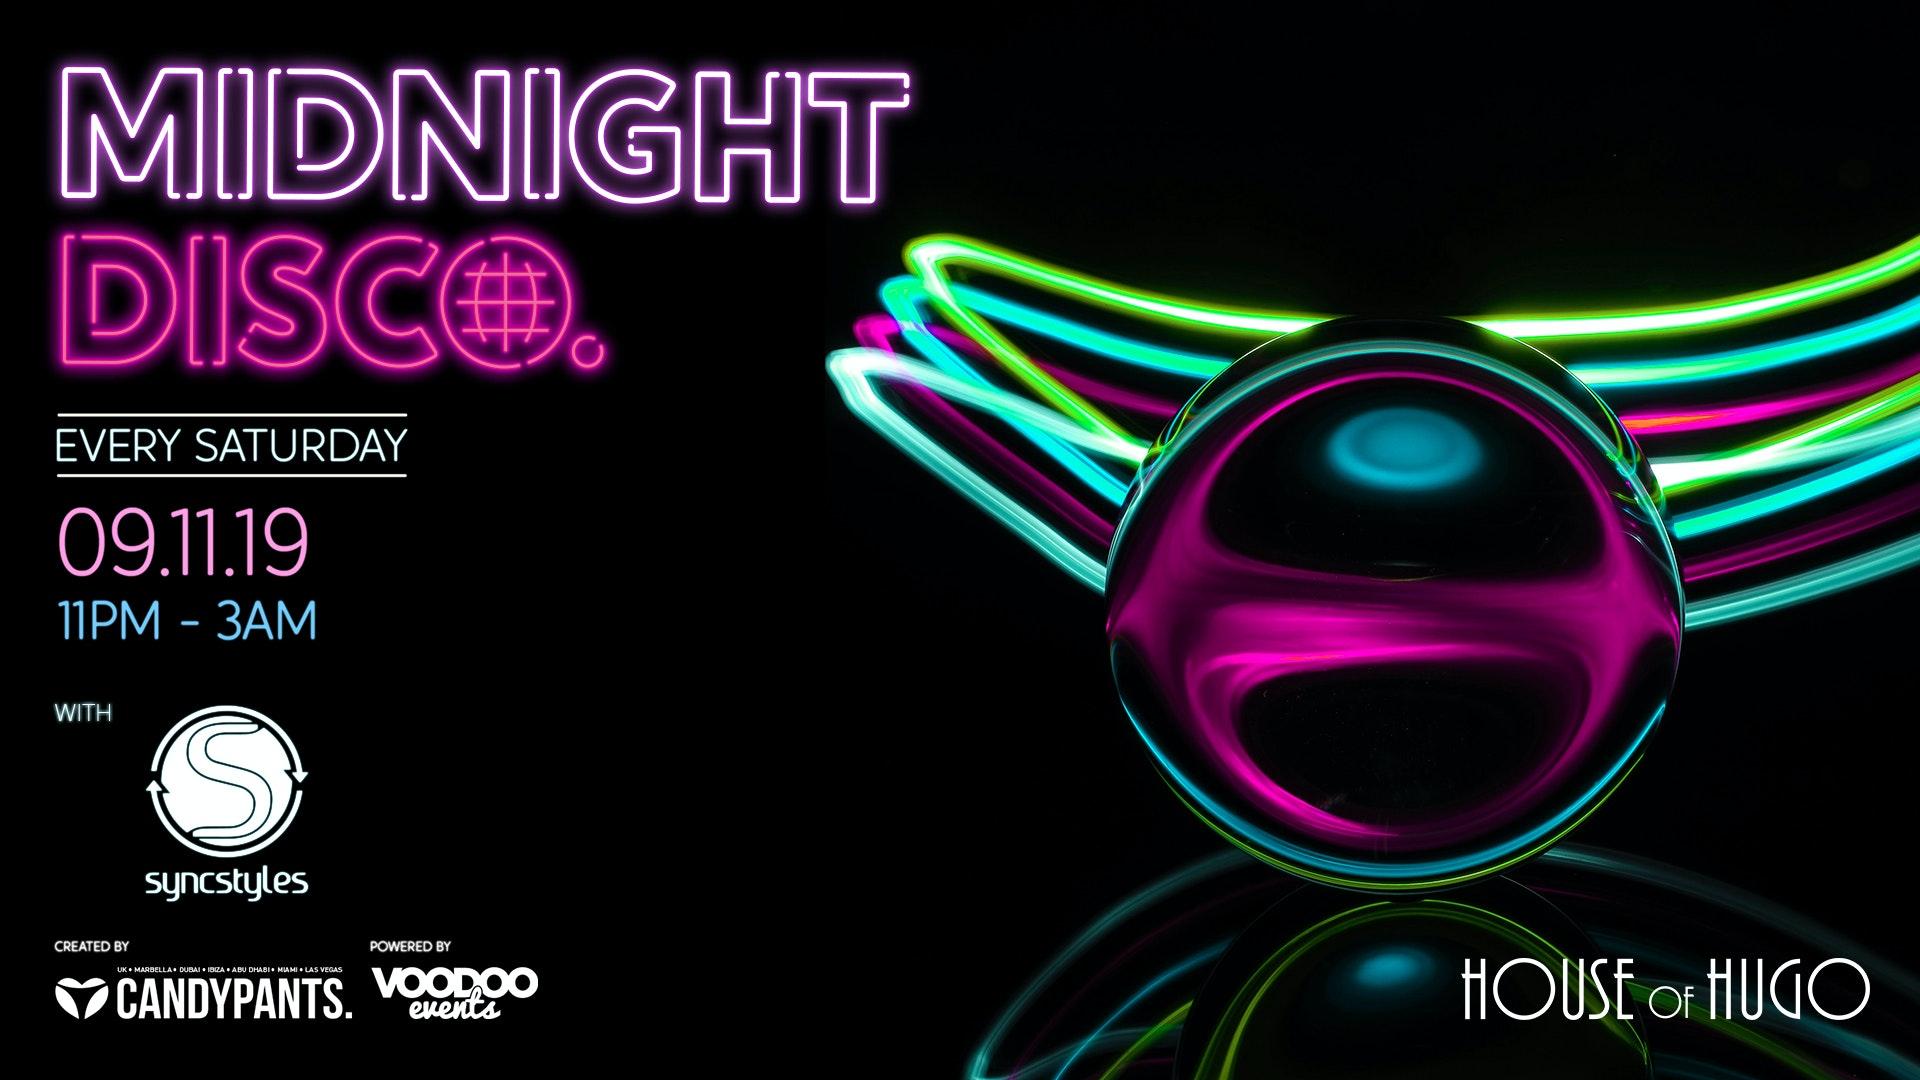 Midnight Disco – House of Hugo – Every Saturday night